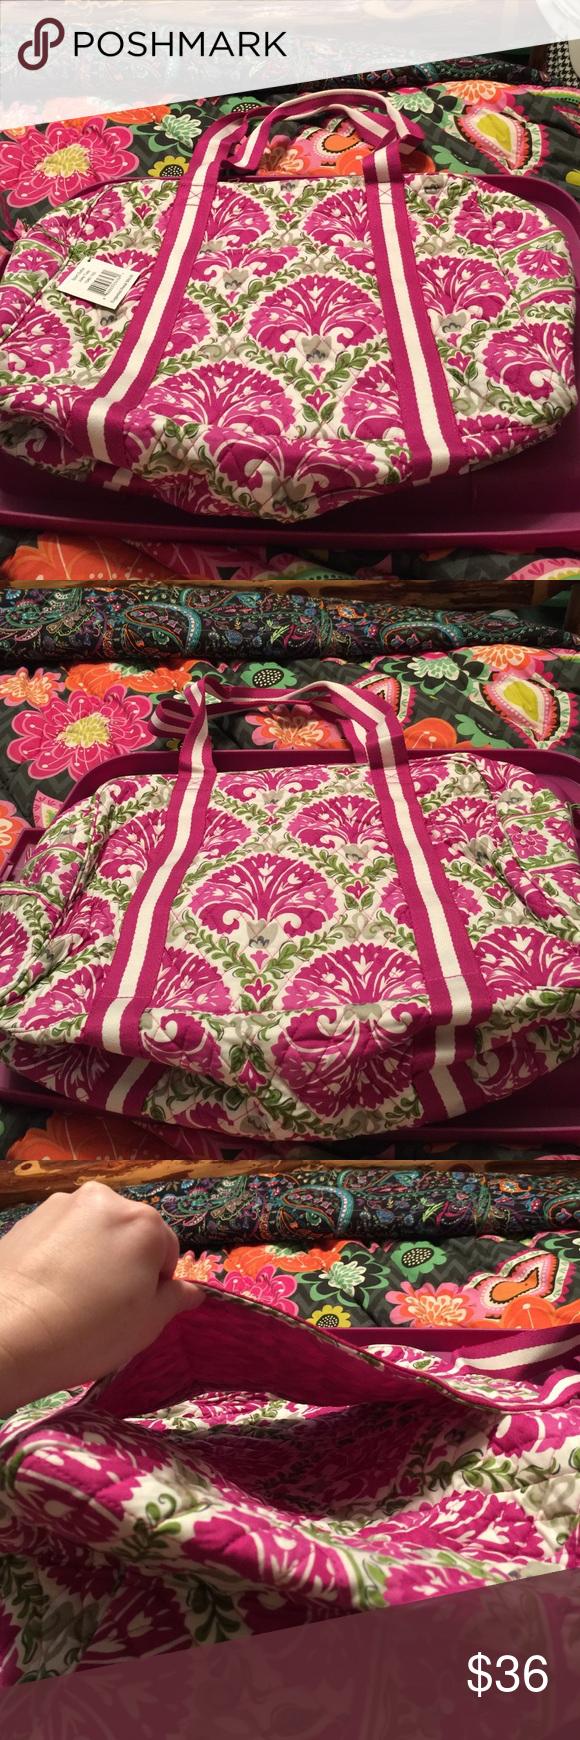 "Vera Bradley sport duffel julep tulip Outside has a slip through compartment for yoga mat or umbrella. Zip top closure. Inside has 3 mesh slip pockets. Approx size is.          17 1/4 w x 12"" h x 7"" d. Vera Bradley Bags Travel Bags"